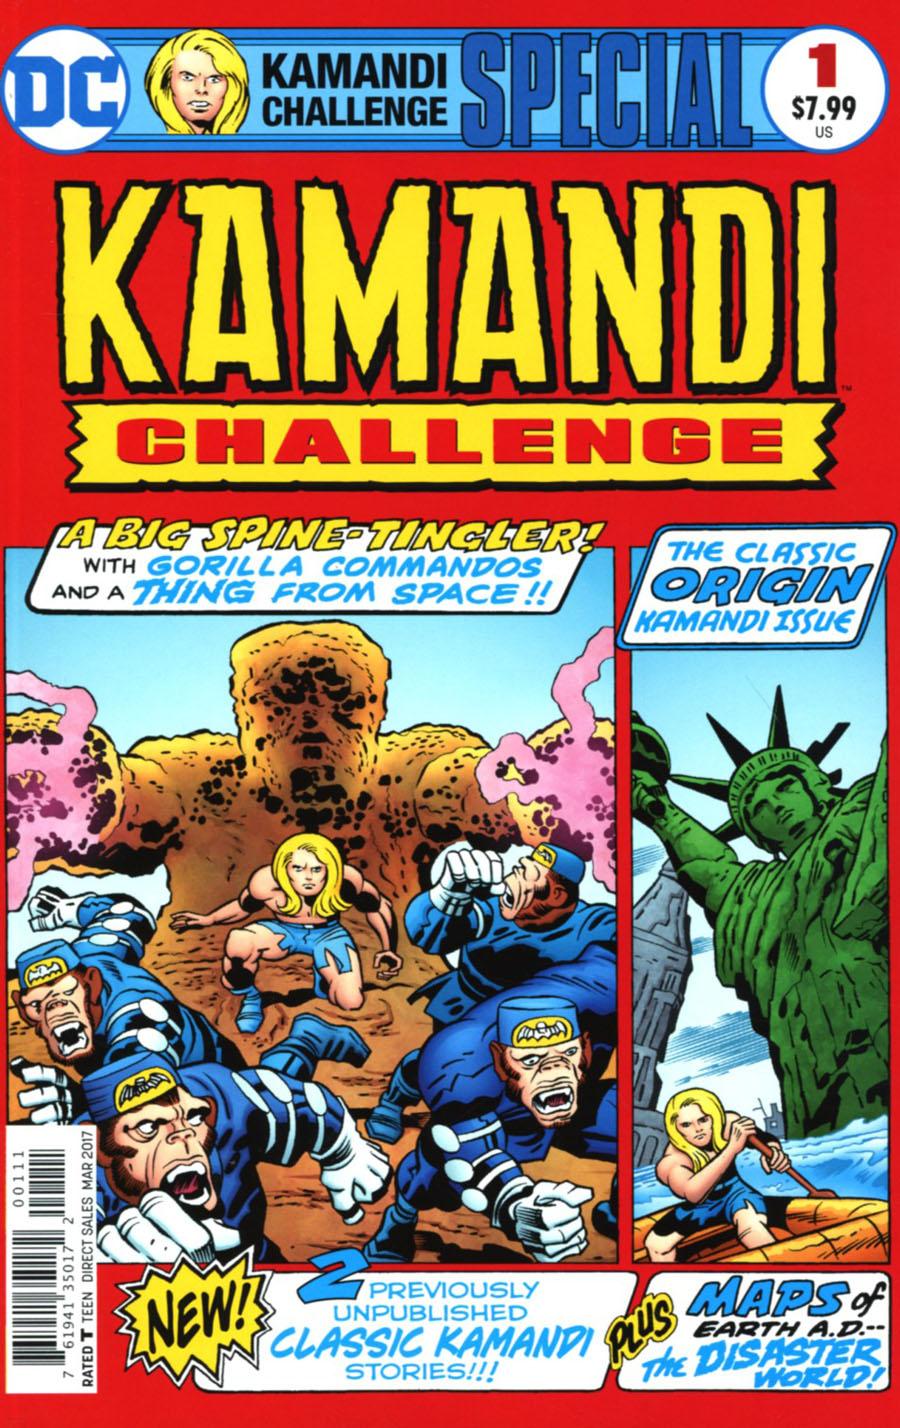 Kamandi Challenge Special #1